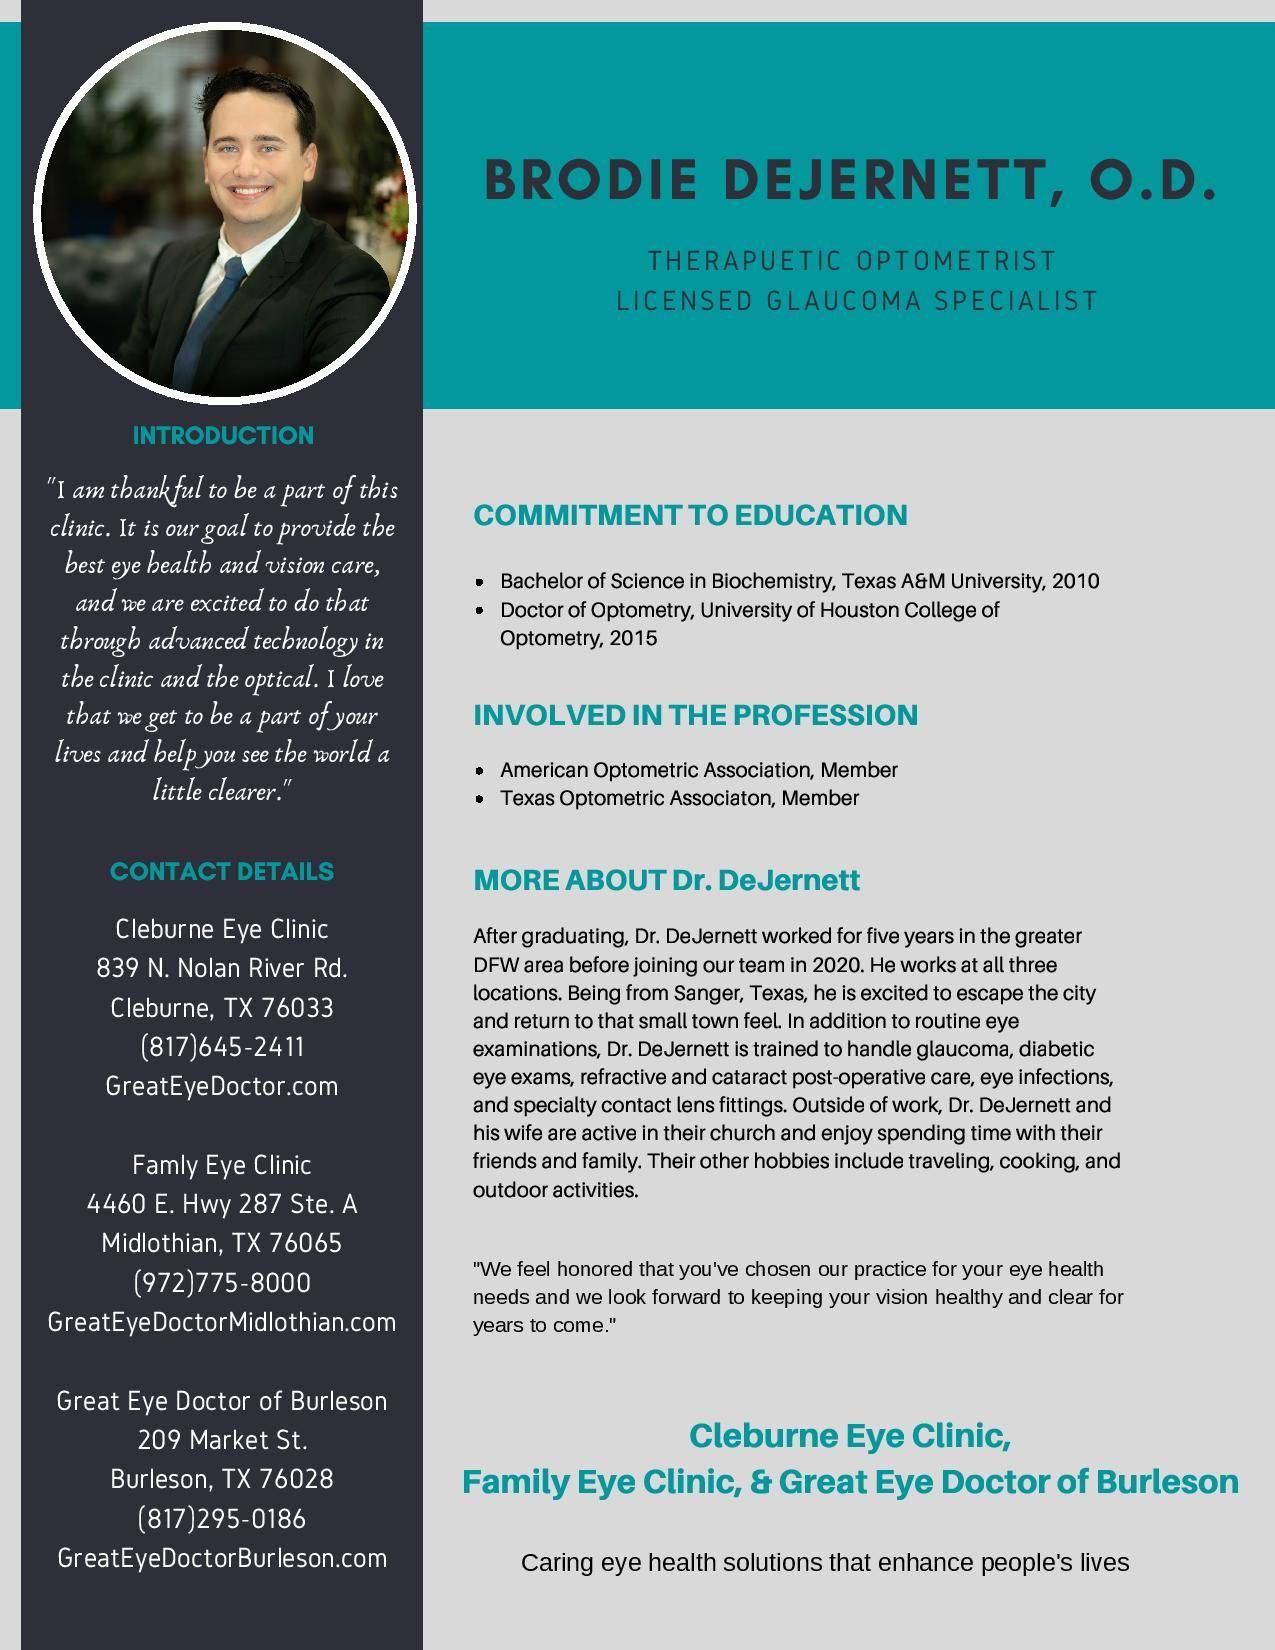 Dr. Brodie DeJernett - Therapeutic Optometrist